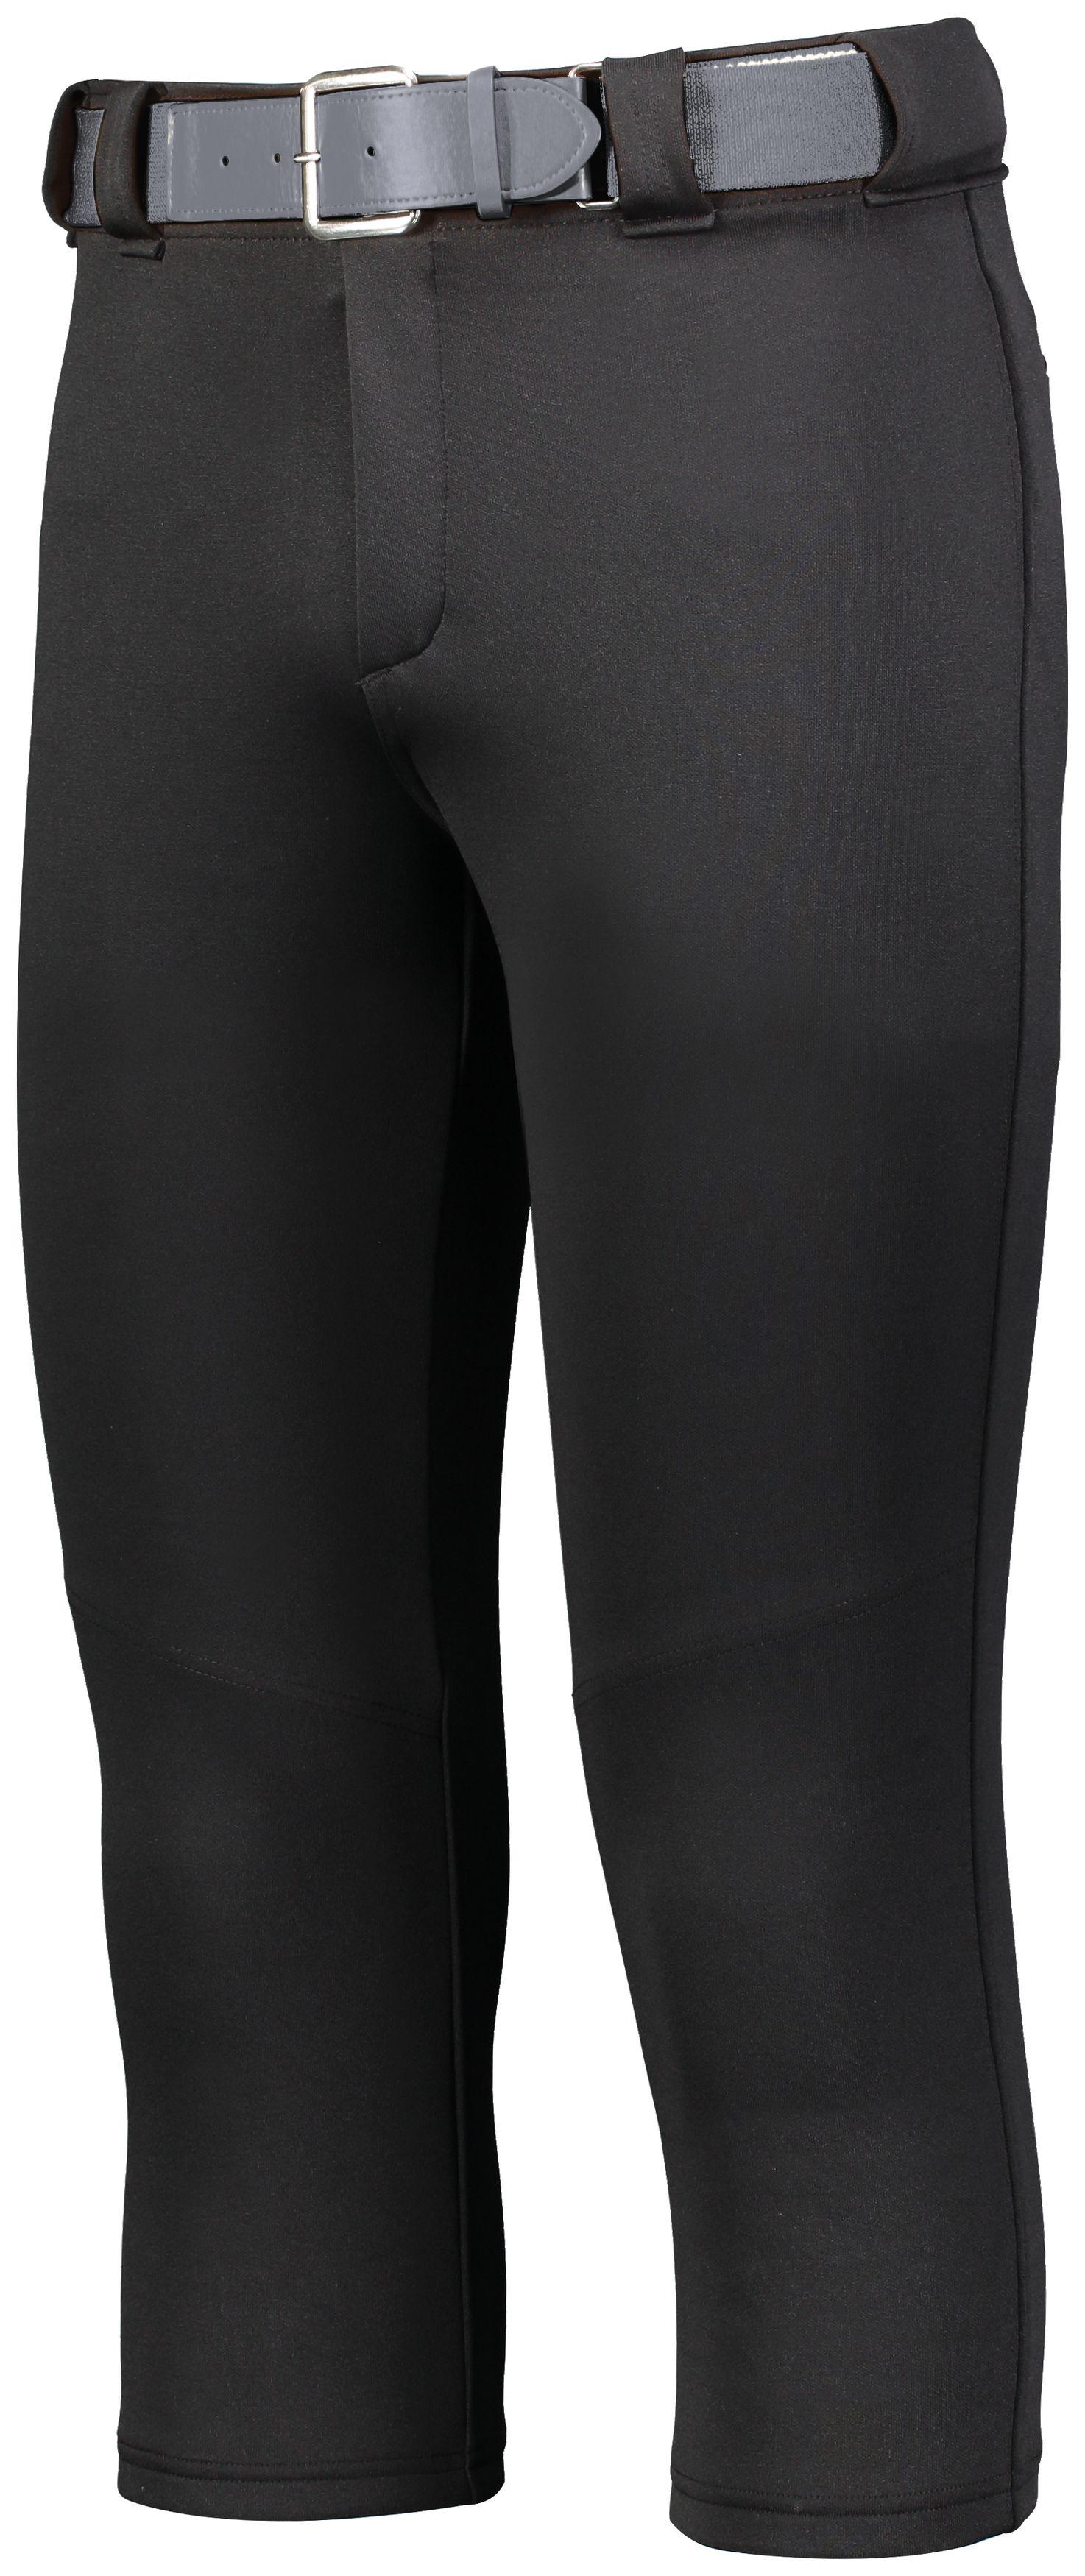 Ladies Slideflex Softball Pant - BLACK